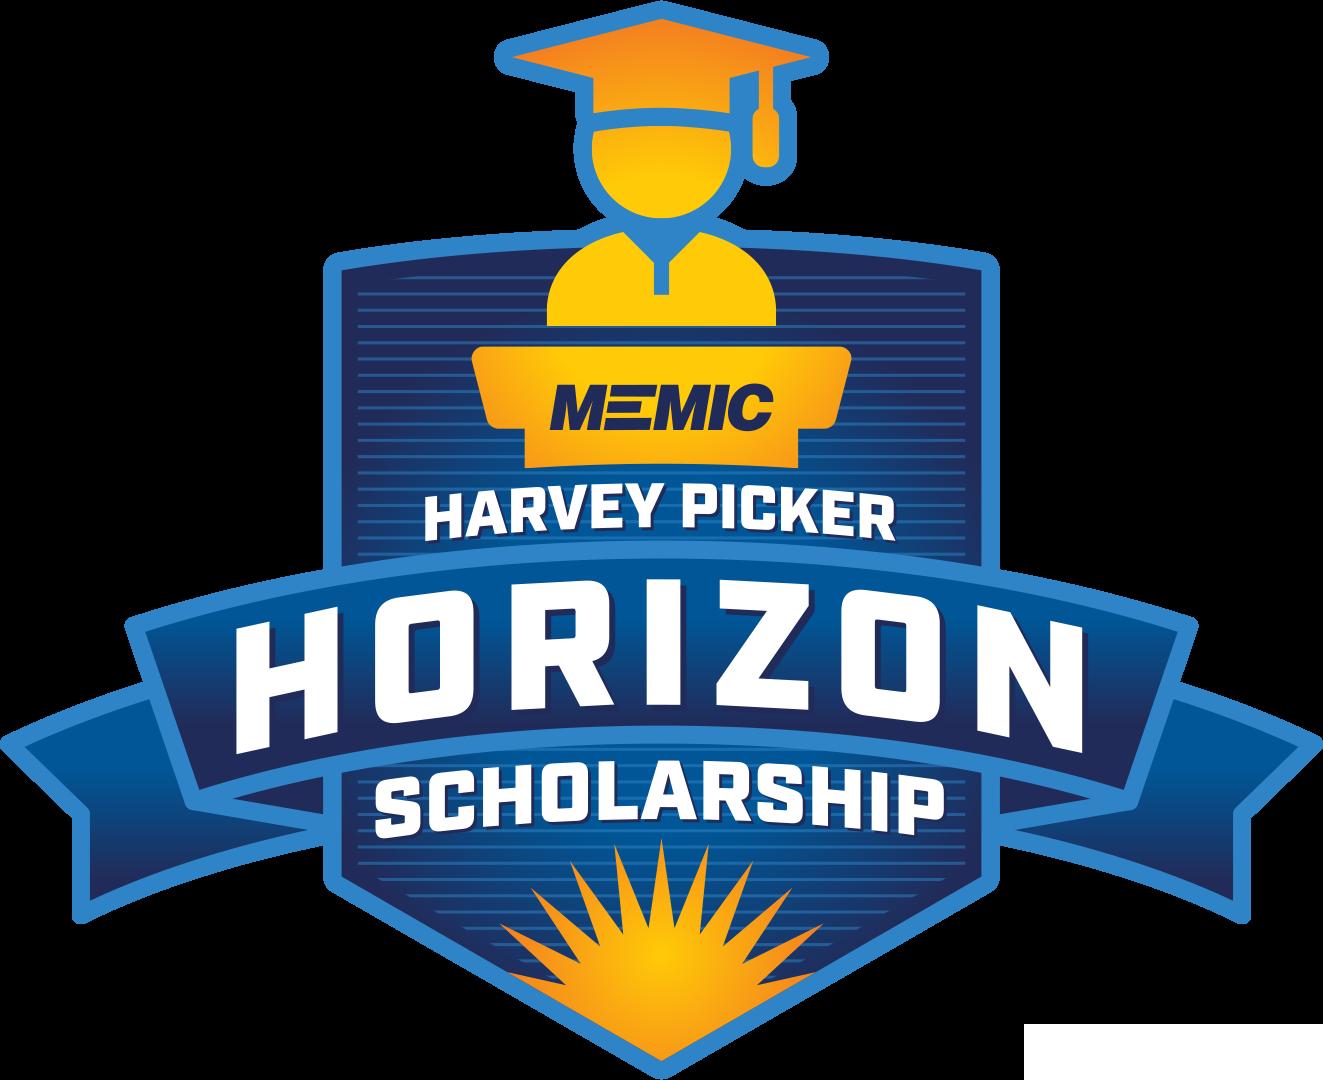 Harvey Picker Horizon Scholarship logo